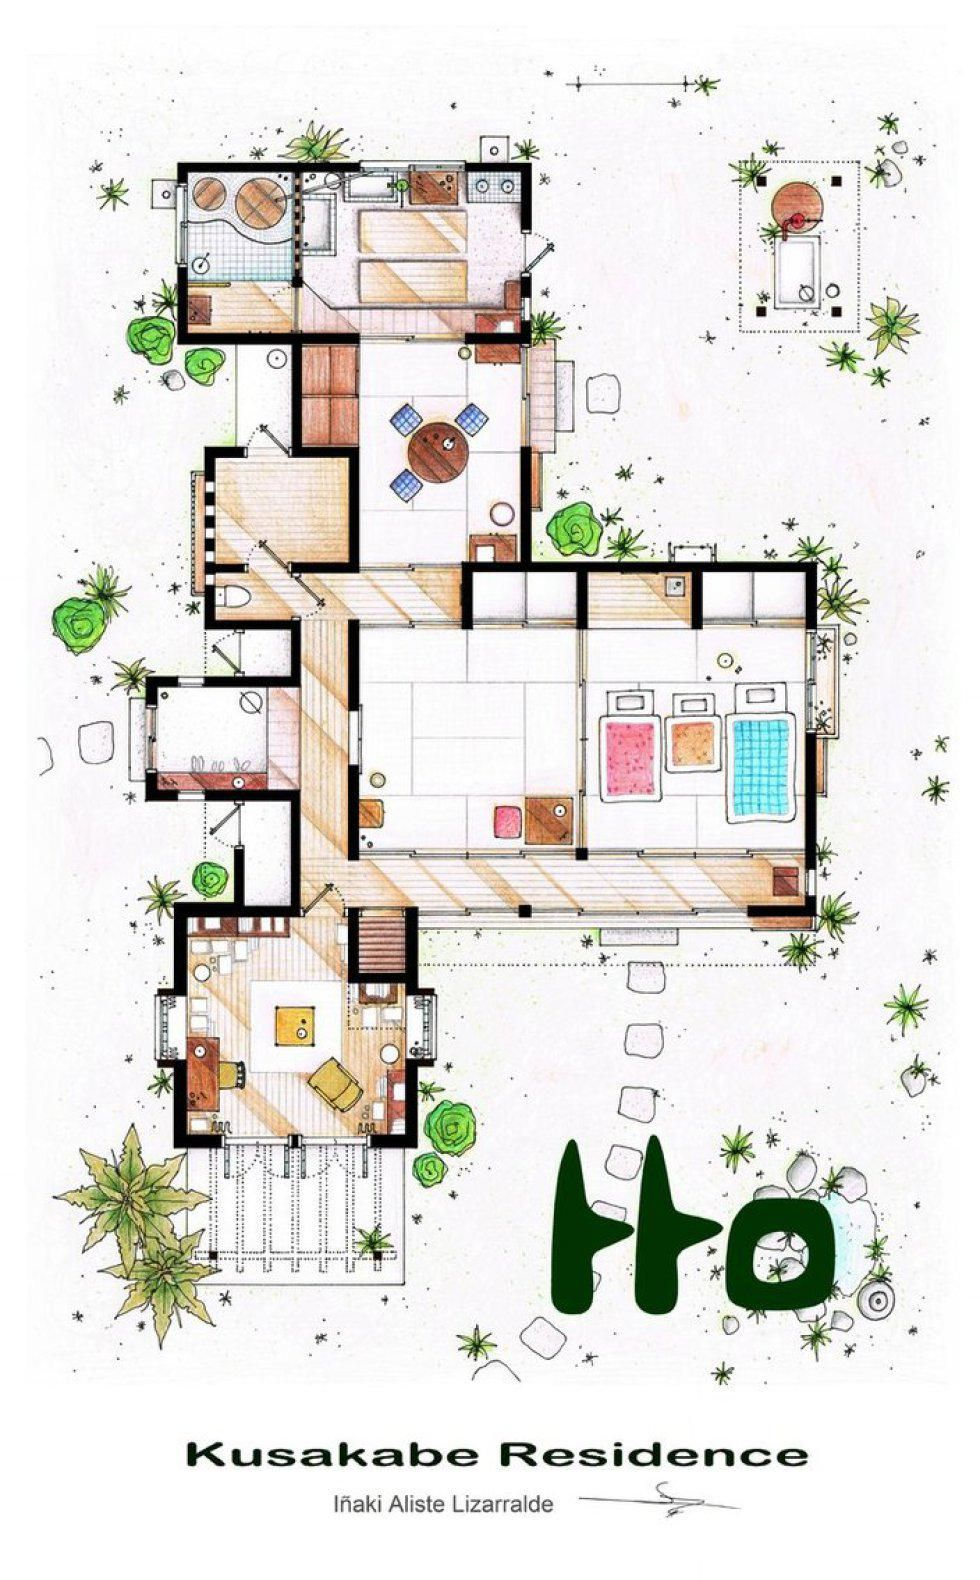 Generaci n ghibli on arquitectura pinterest floor for Casa minimalista dwg